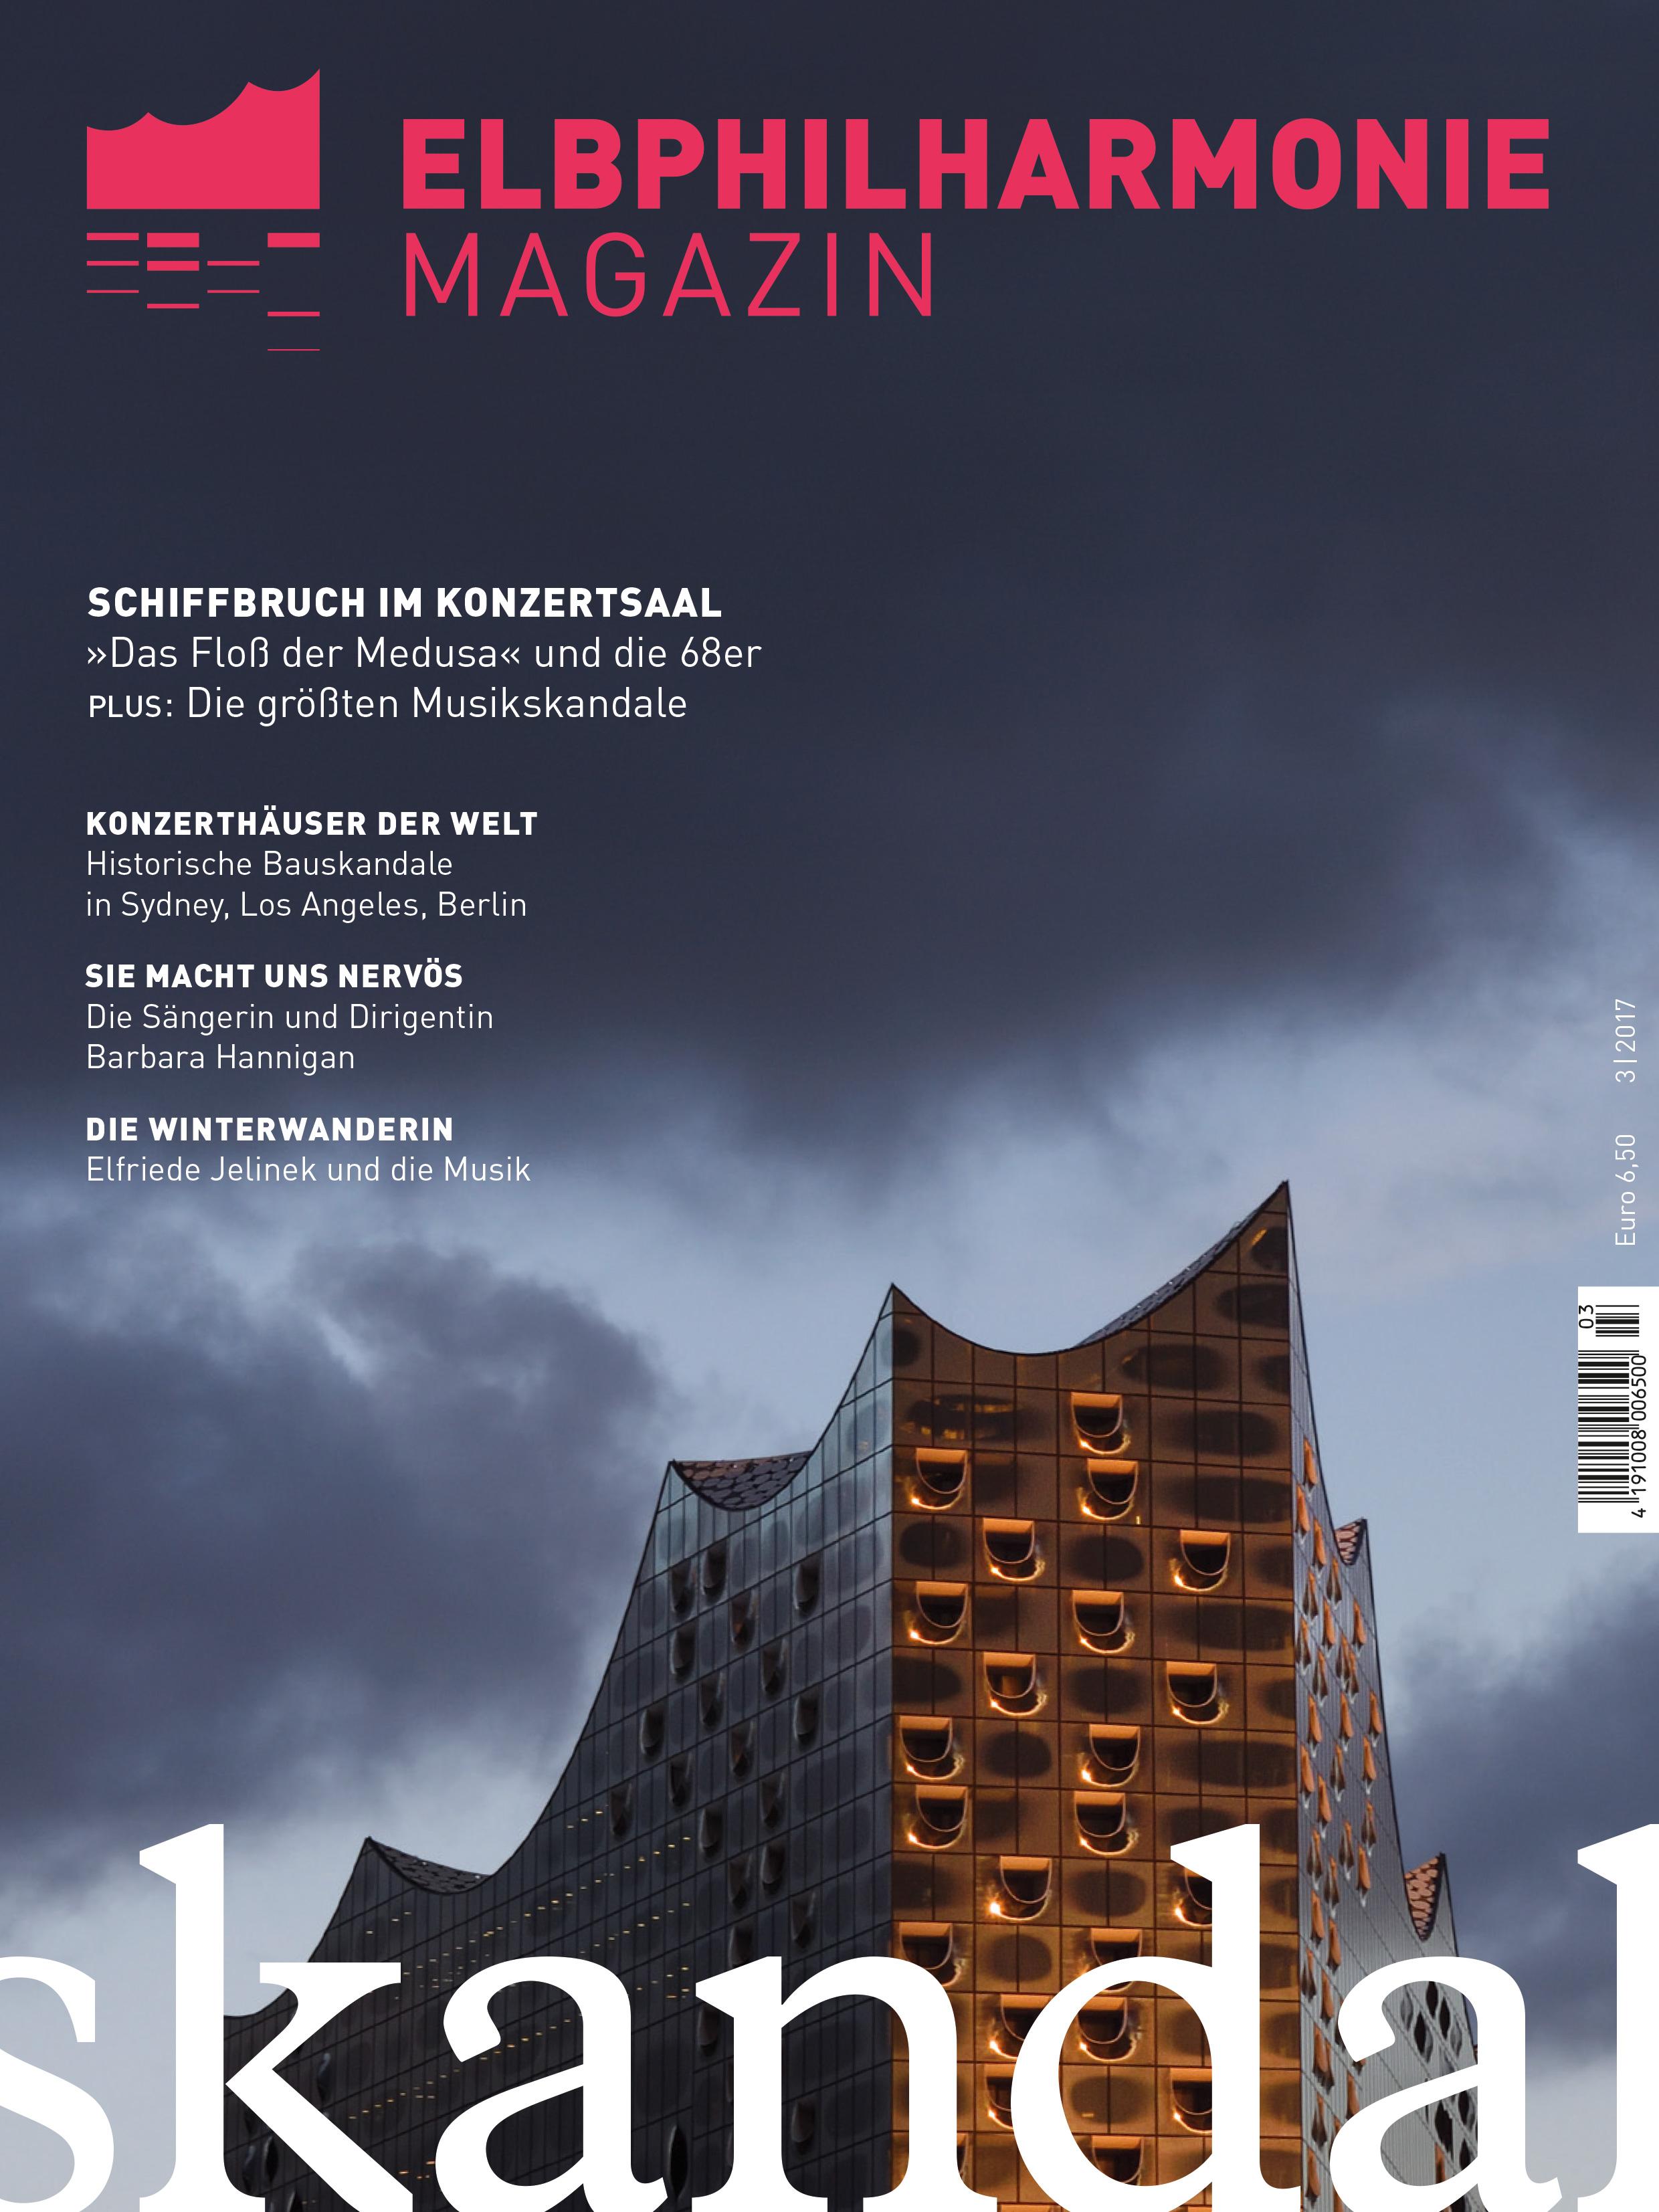 Elbphilharmonie Magazin 3/2017